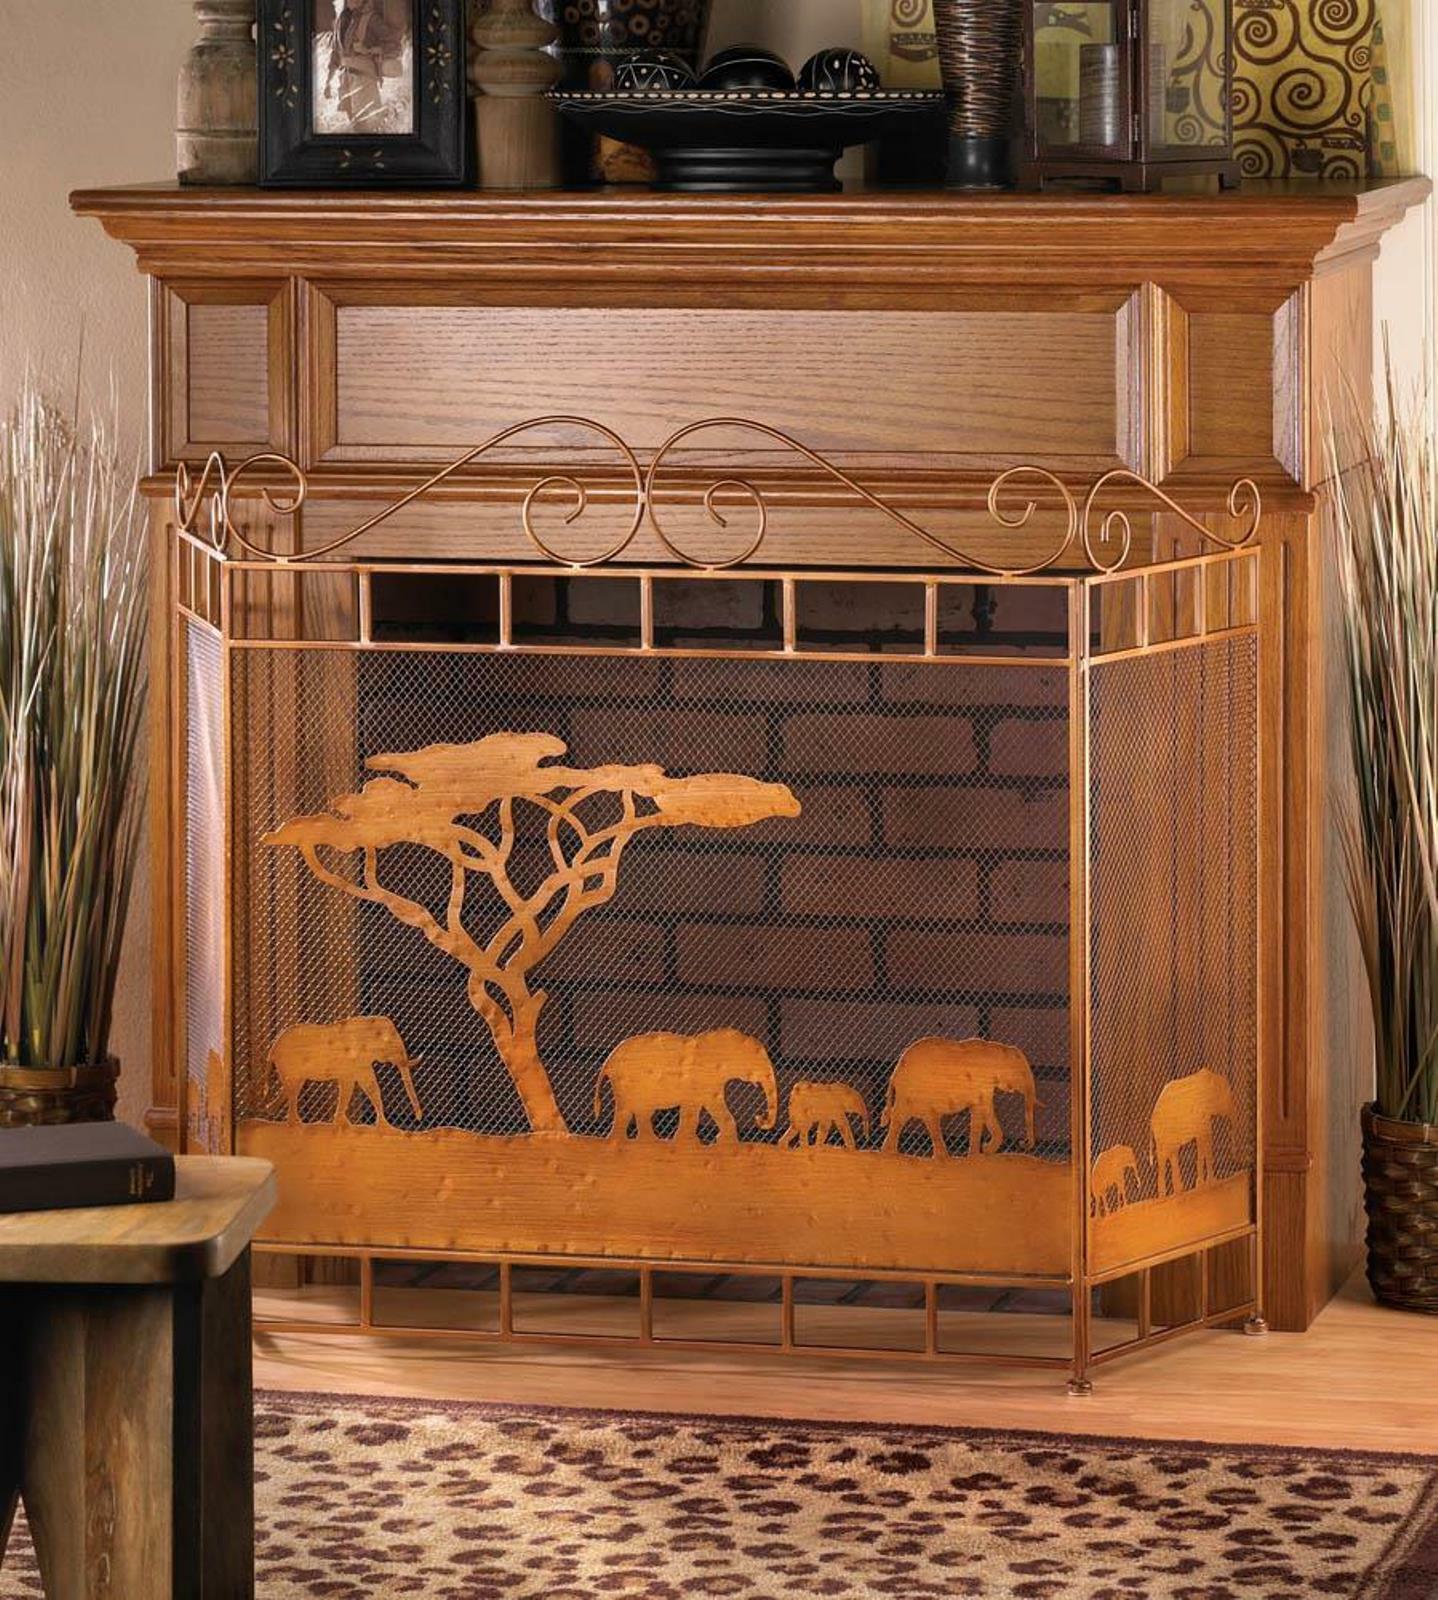 VERDUGO GIFT CO Wild Savannah Fireplace Screen